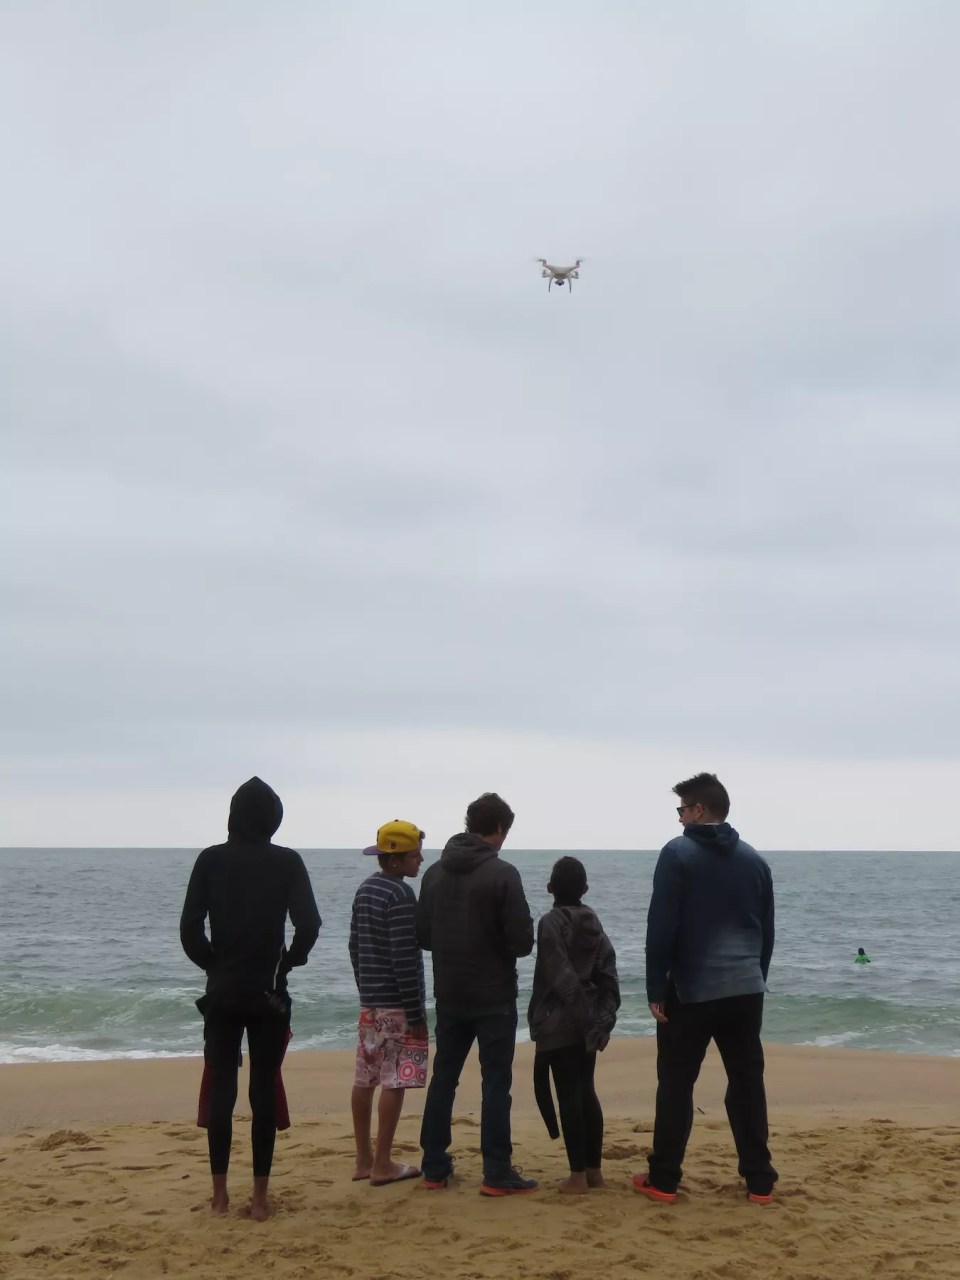 live_drone_foto_kadu_malucelli